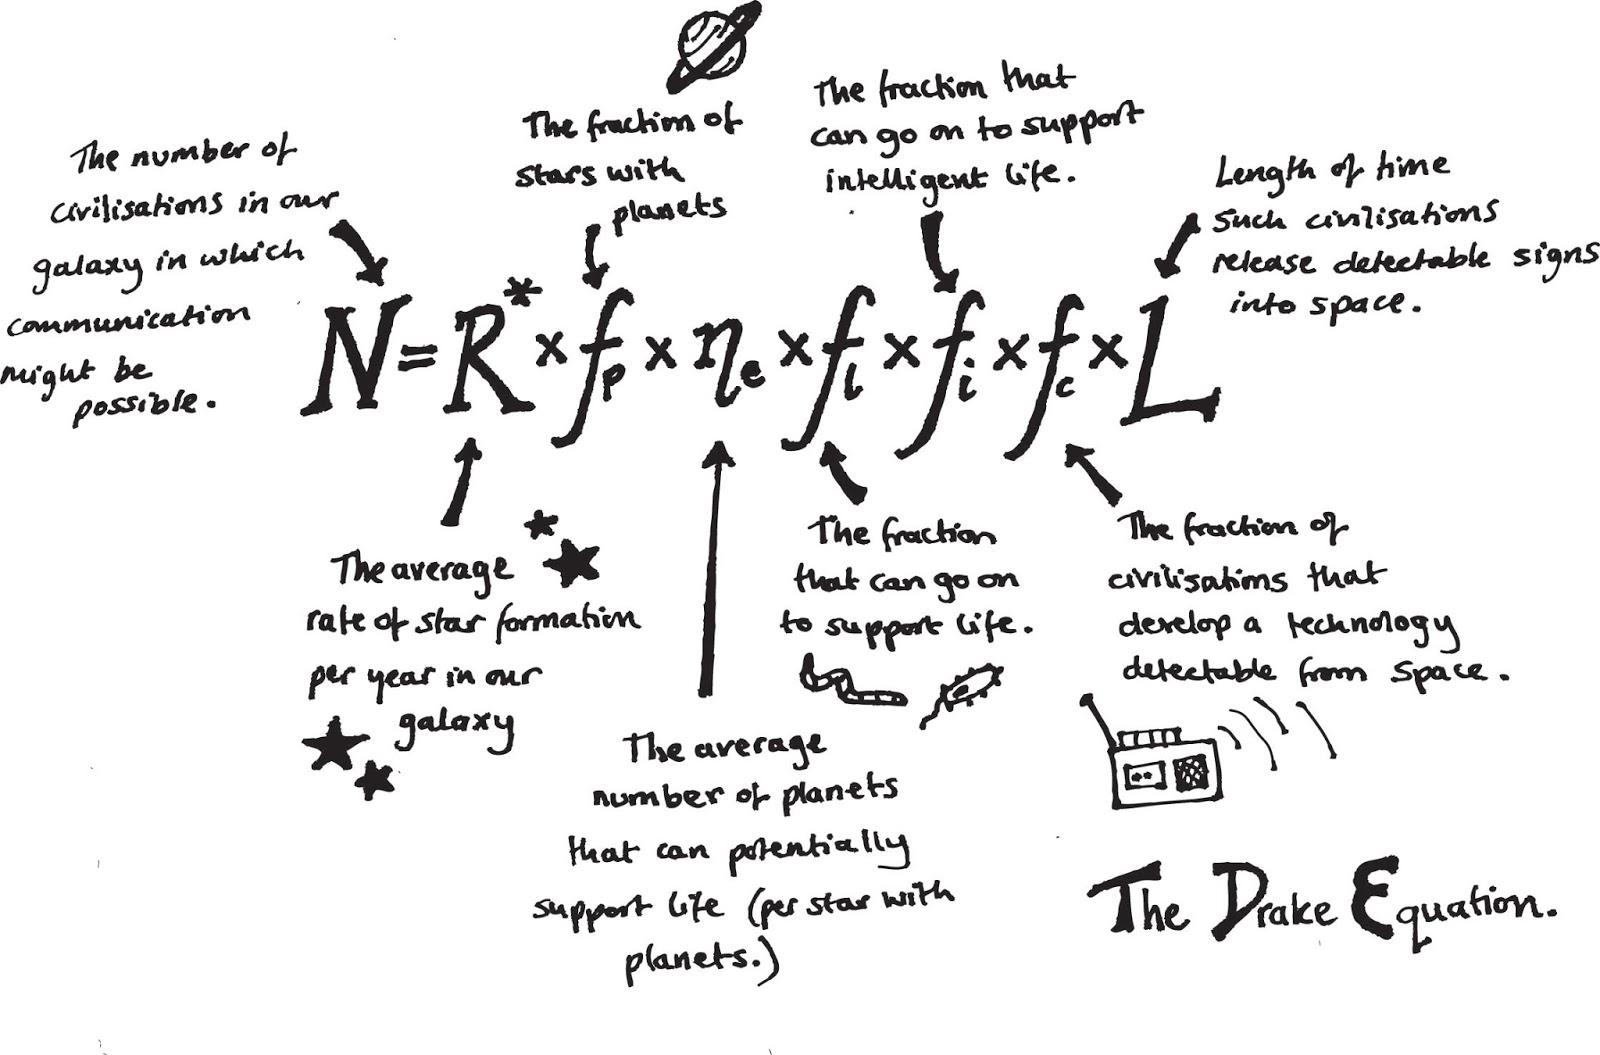 Image credit: Dr. Molecule from Futurism.com